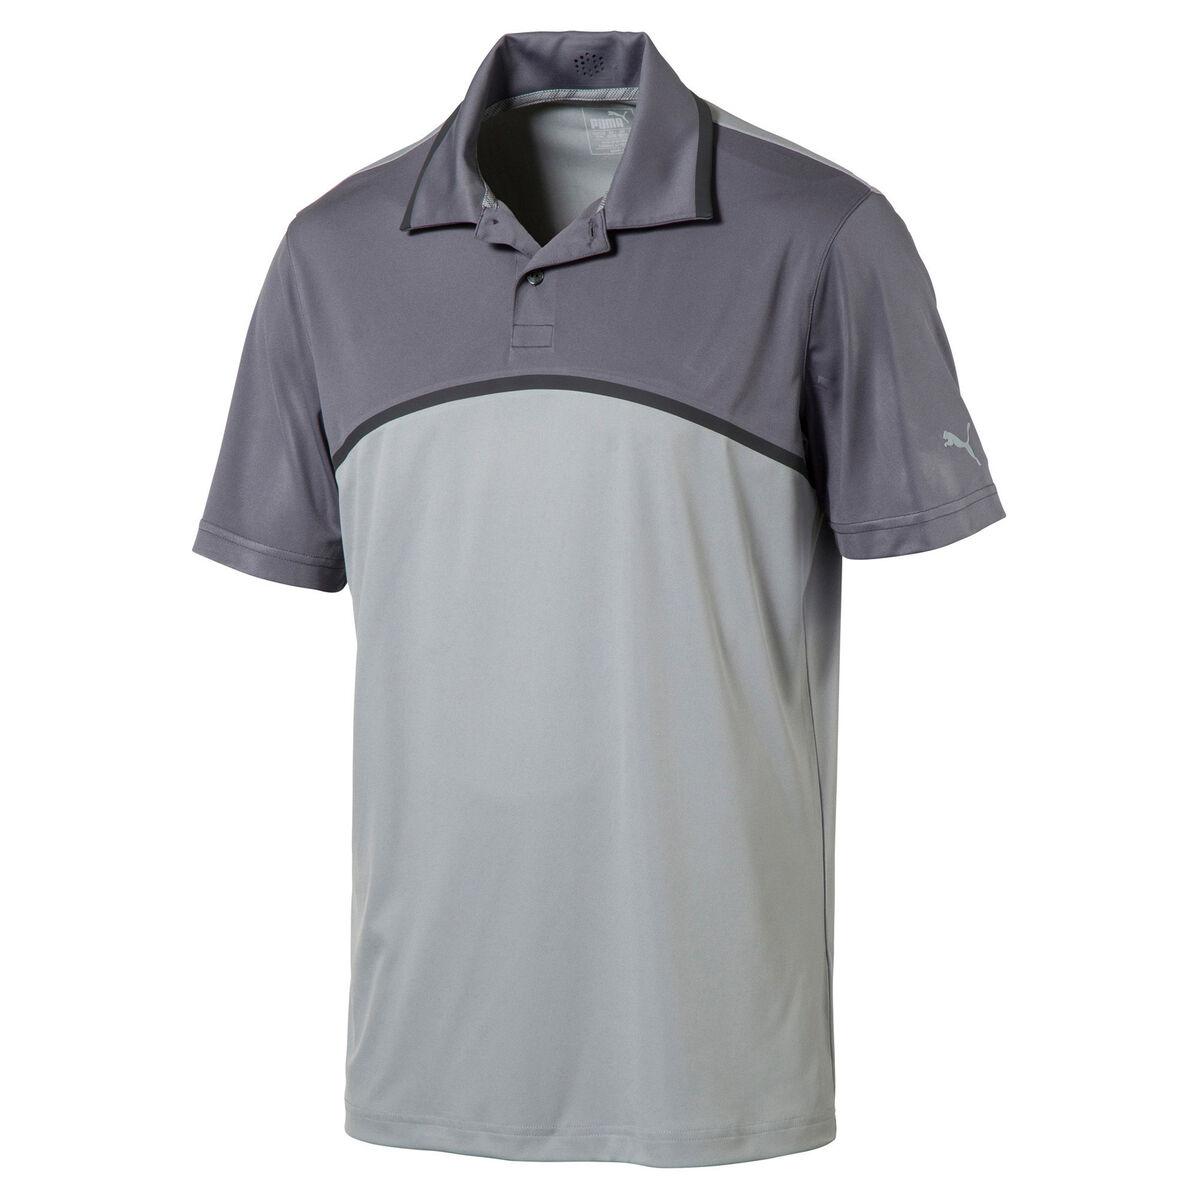 885d0d3c PUMA Tailored Colorblock Polo | PGA TOUR Superstore